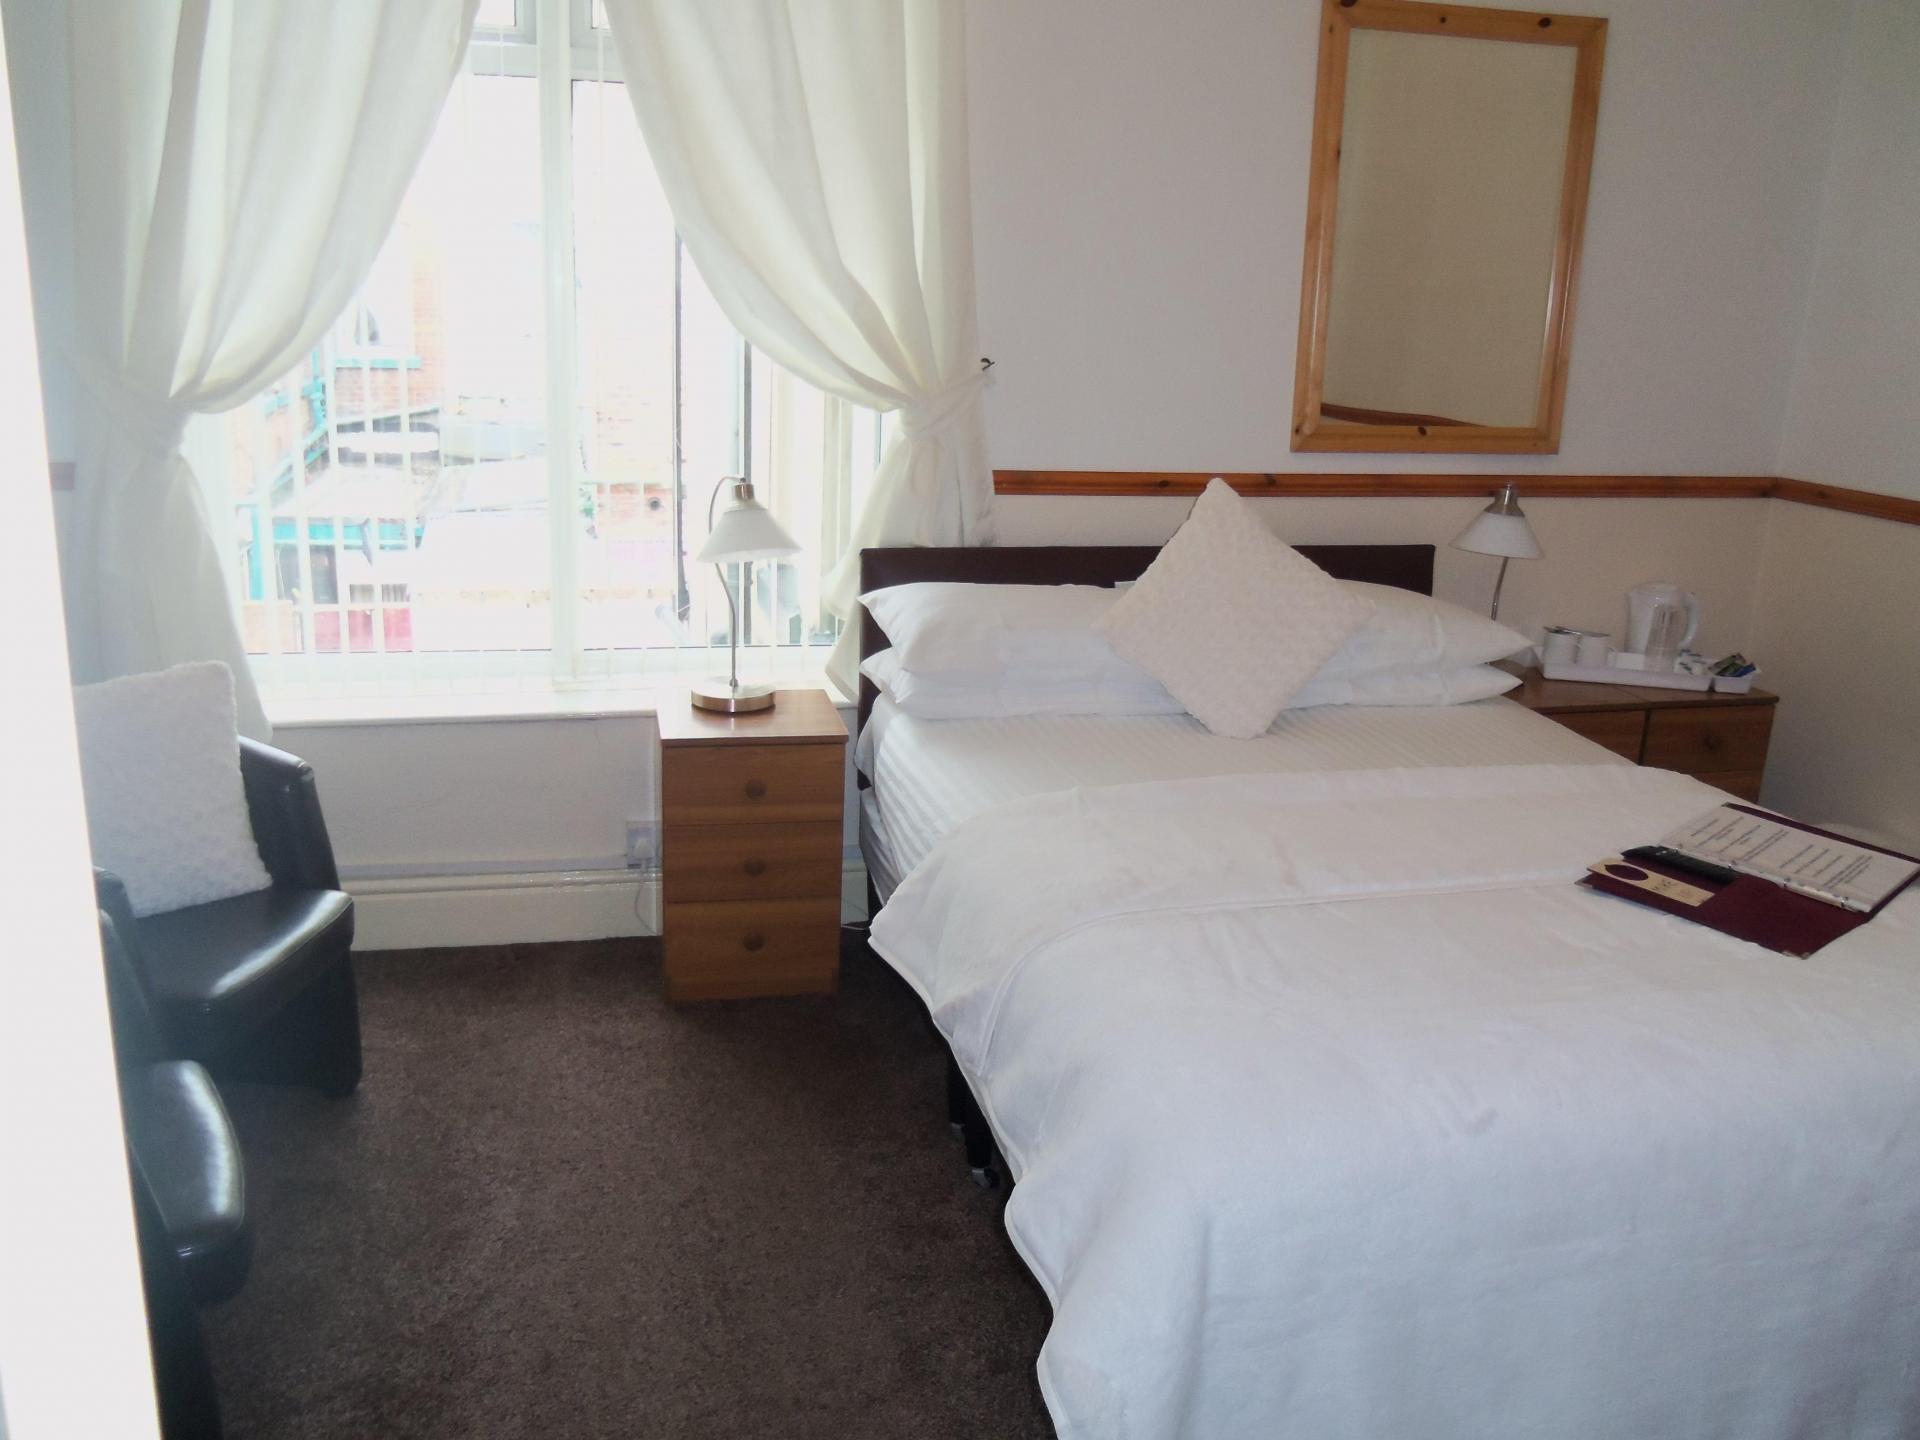 lynbar hotel blackpool lancashire fy1 4qd hotels uk com